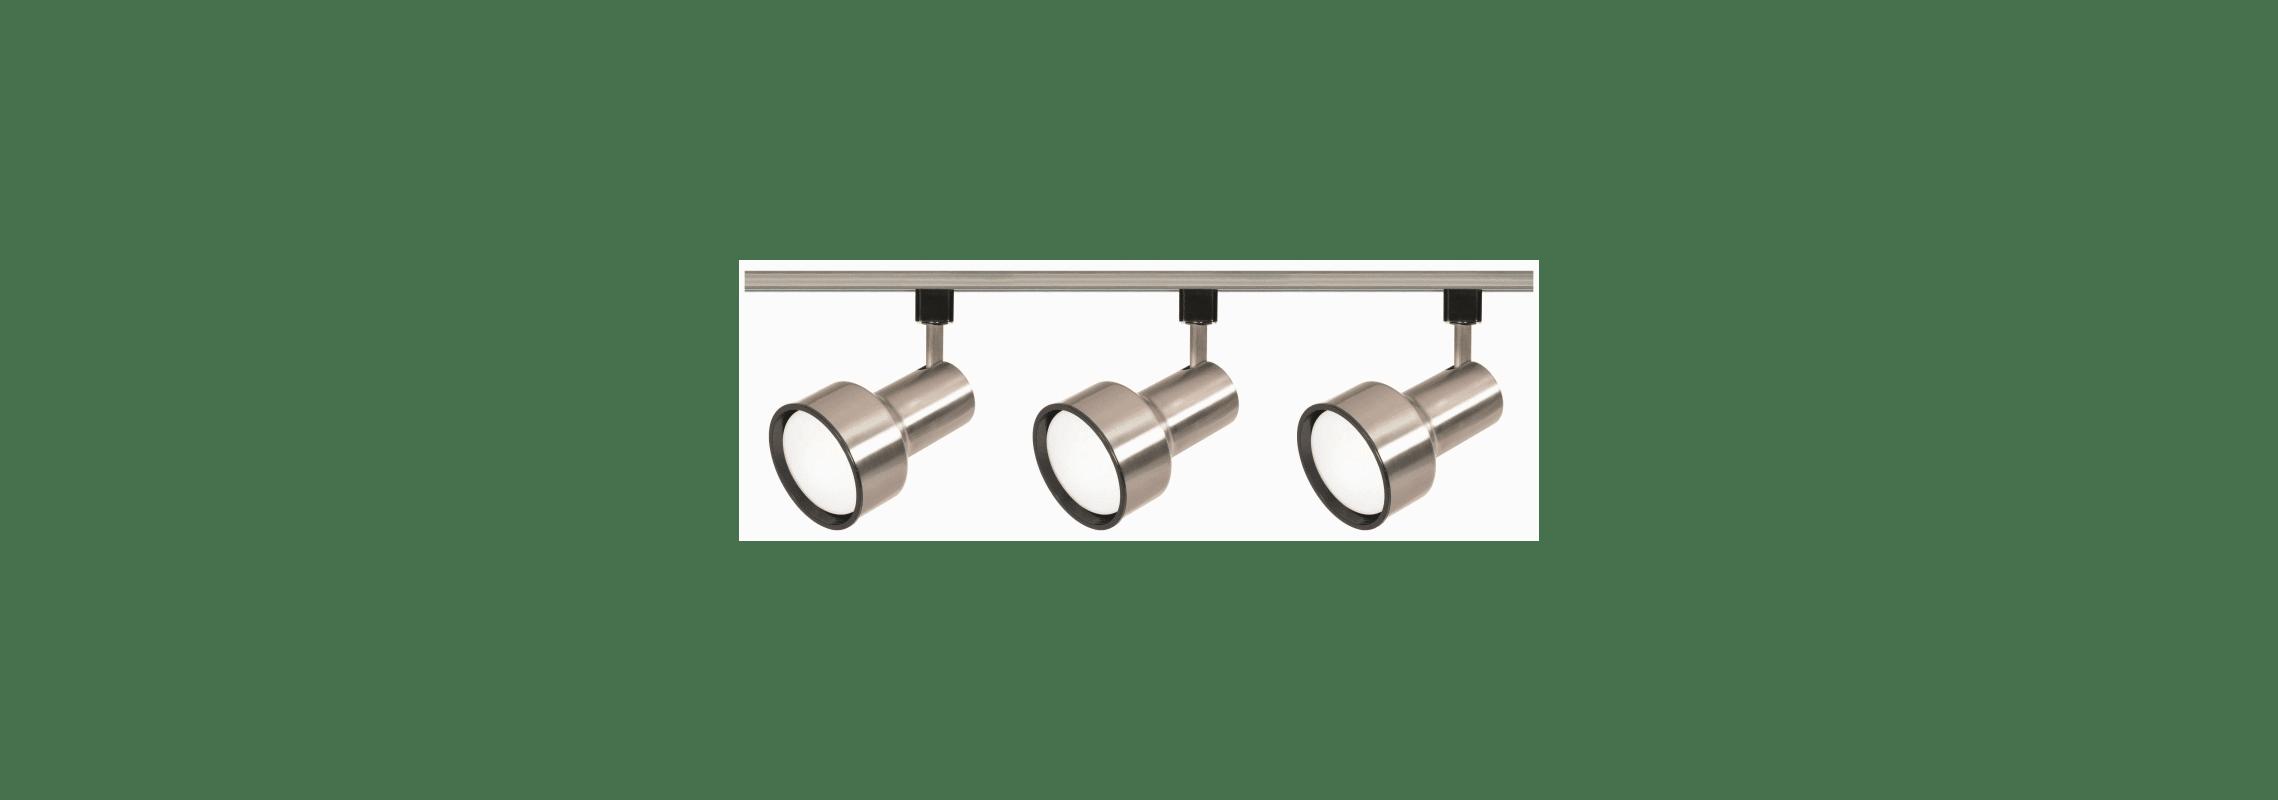 Nuvo Lighting Tk340 Brushed Nickel Three Light R30 Step